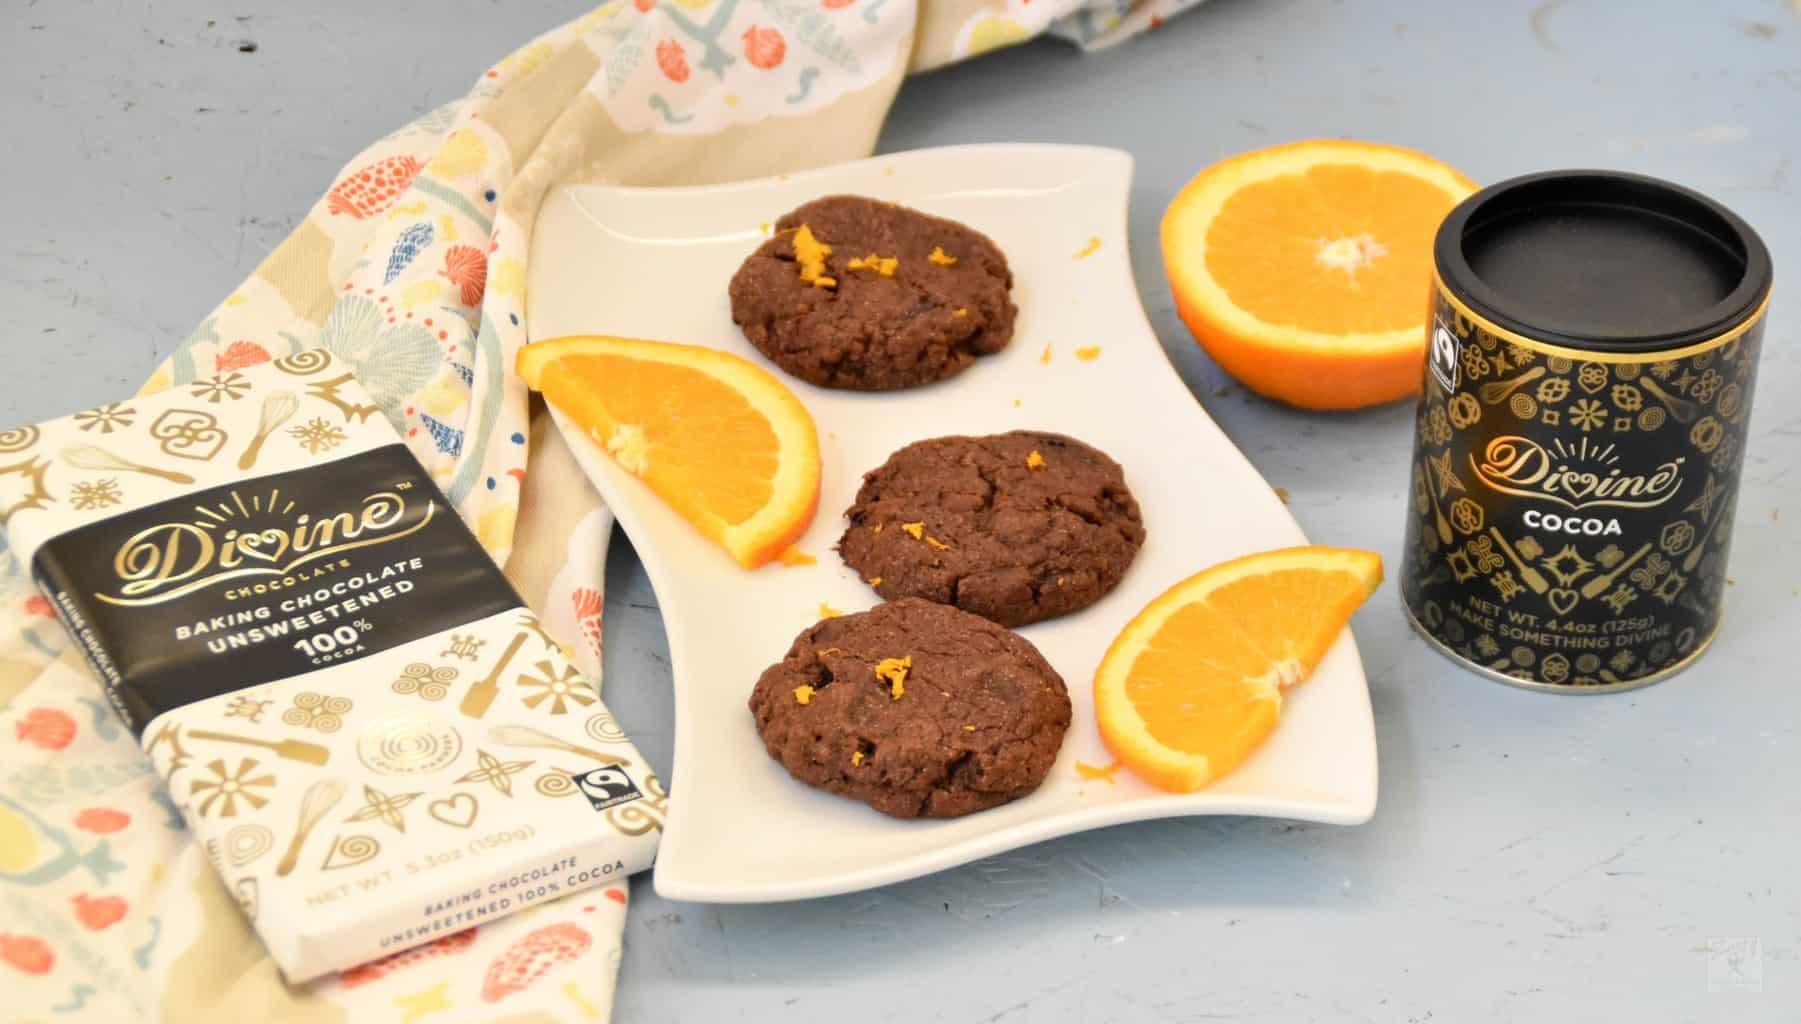 "<img src=""https://cdn.shortpixel.ai/client/q_glossy,ret_img,w_4096,h_2329/Vegan double chocolate orange cookies.jpg"" alt=""Vegan double chocolate orange cookies1"">"